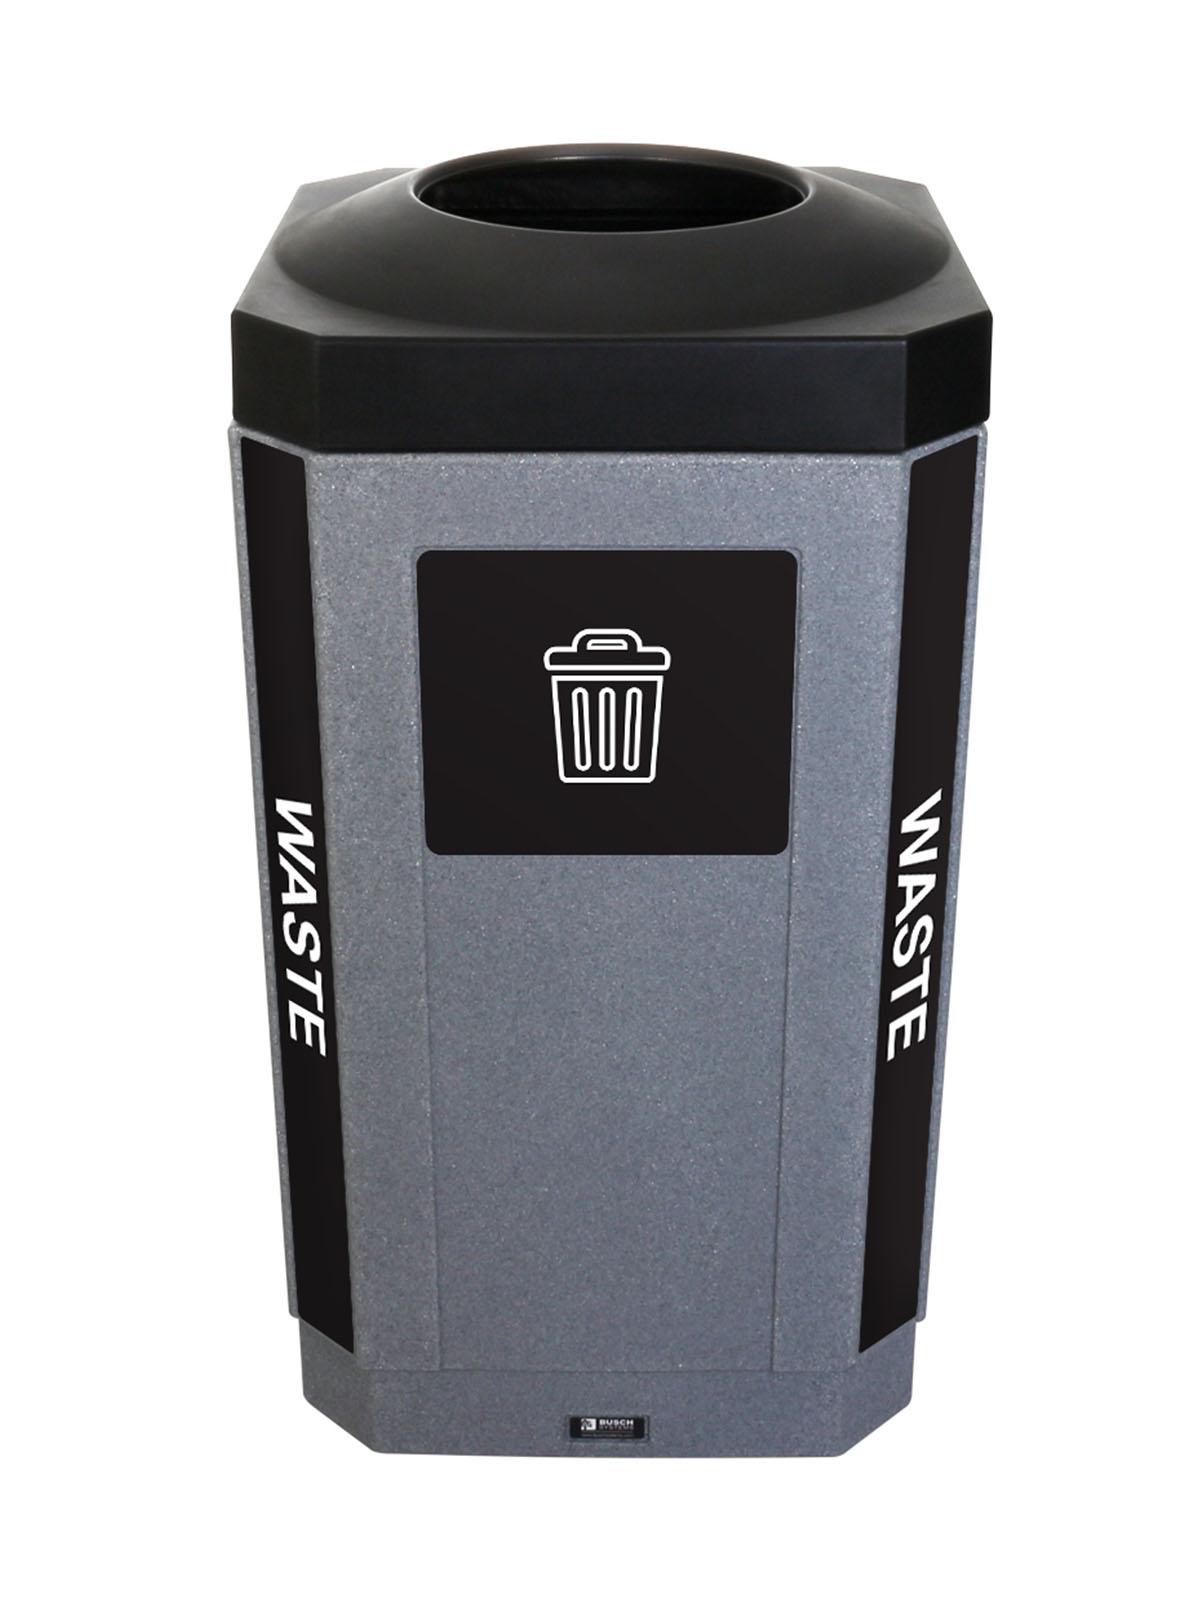 OCTO - Single - Indoor - Waste - Full - Greystone-Black